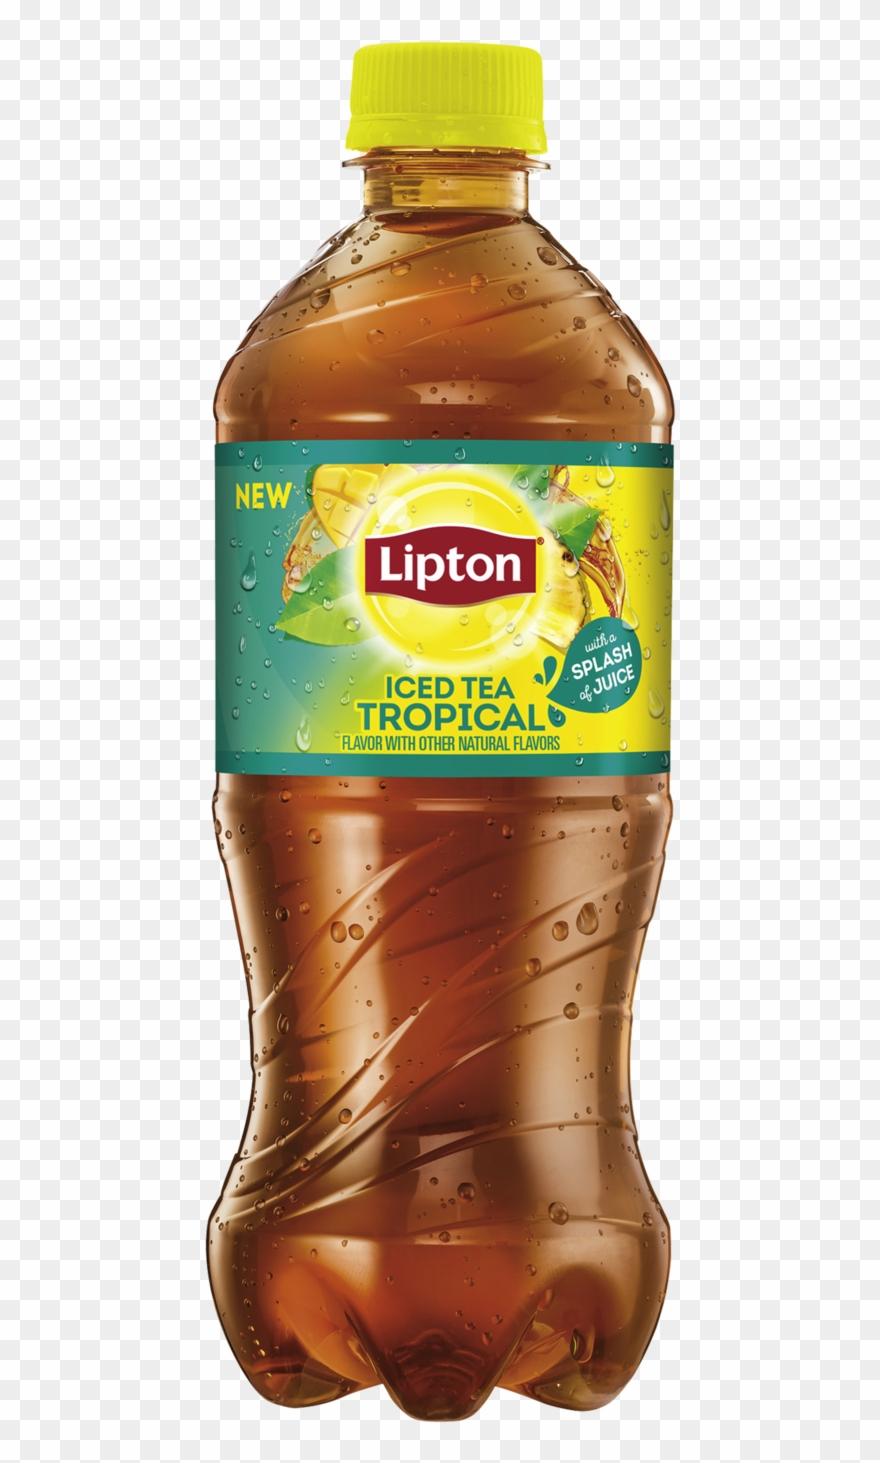 Lipton tea clipart clip freeuse Iced Tea Png - Lipton Iced Tea Tropical Clipart (#3496432 ... clip freeuse